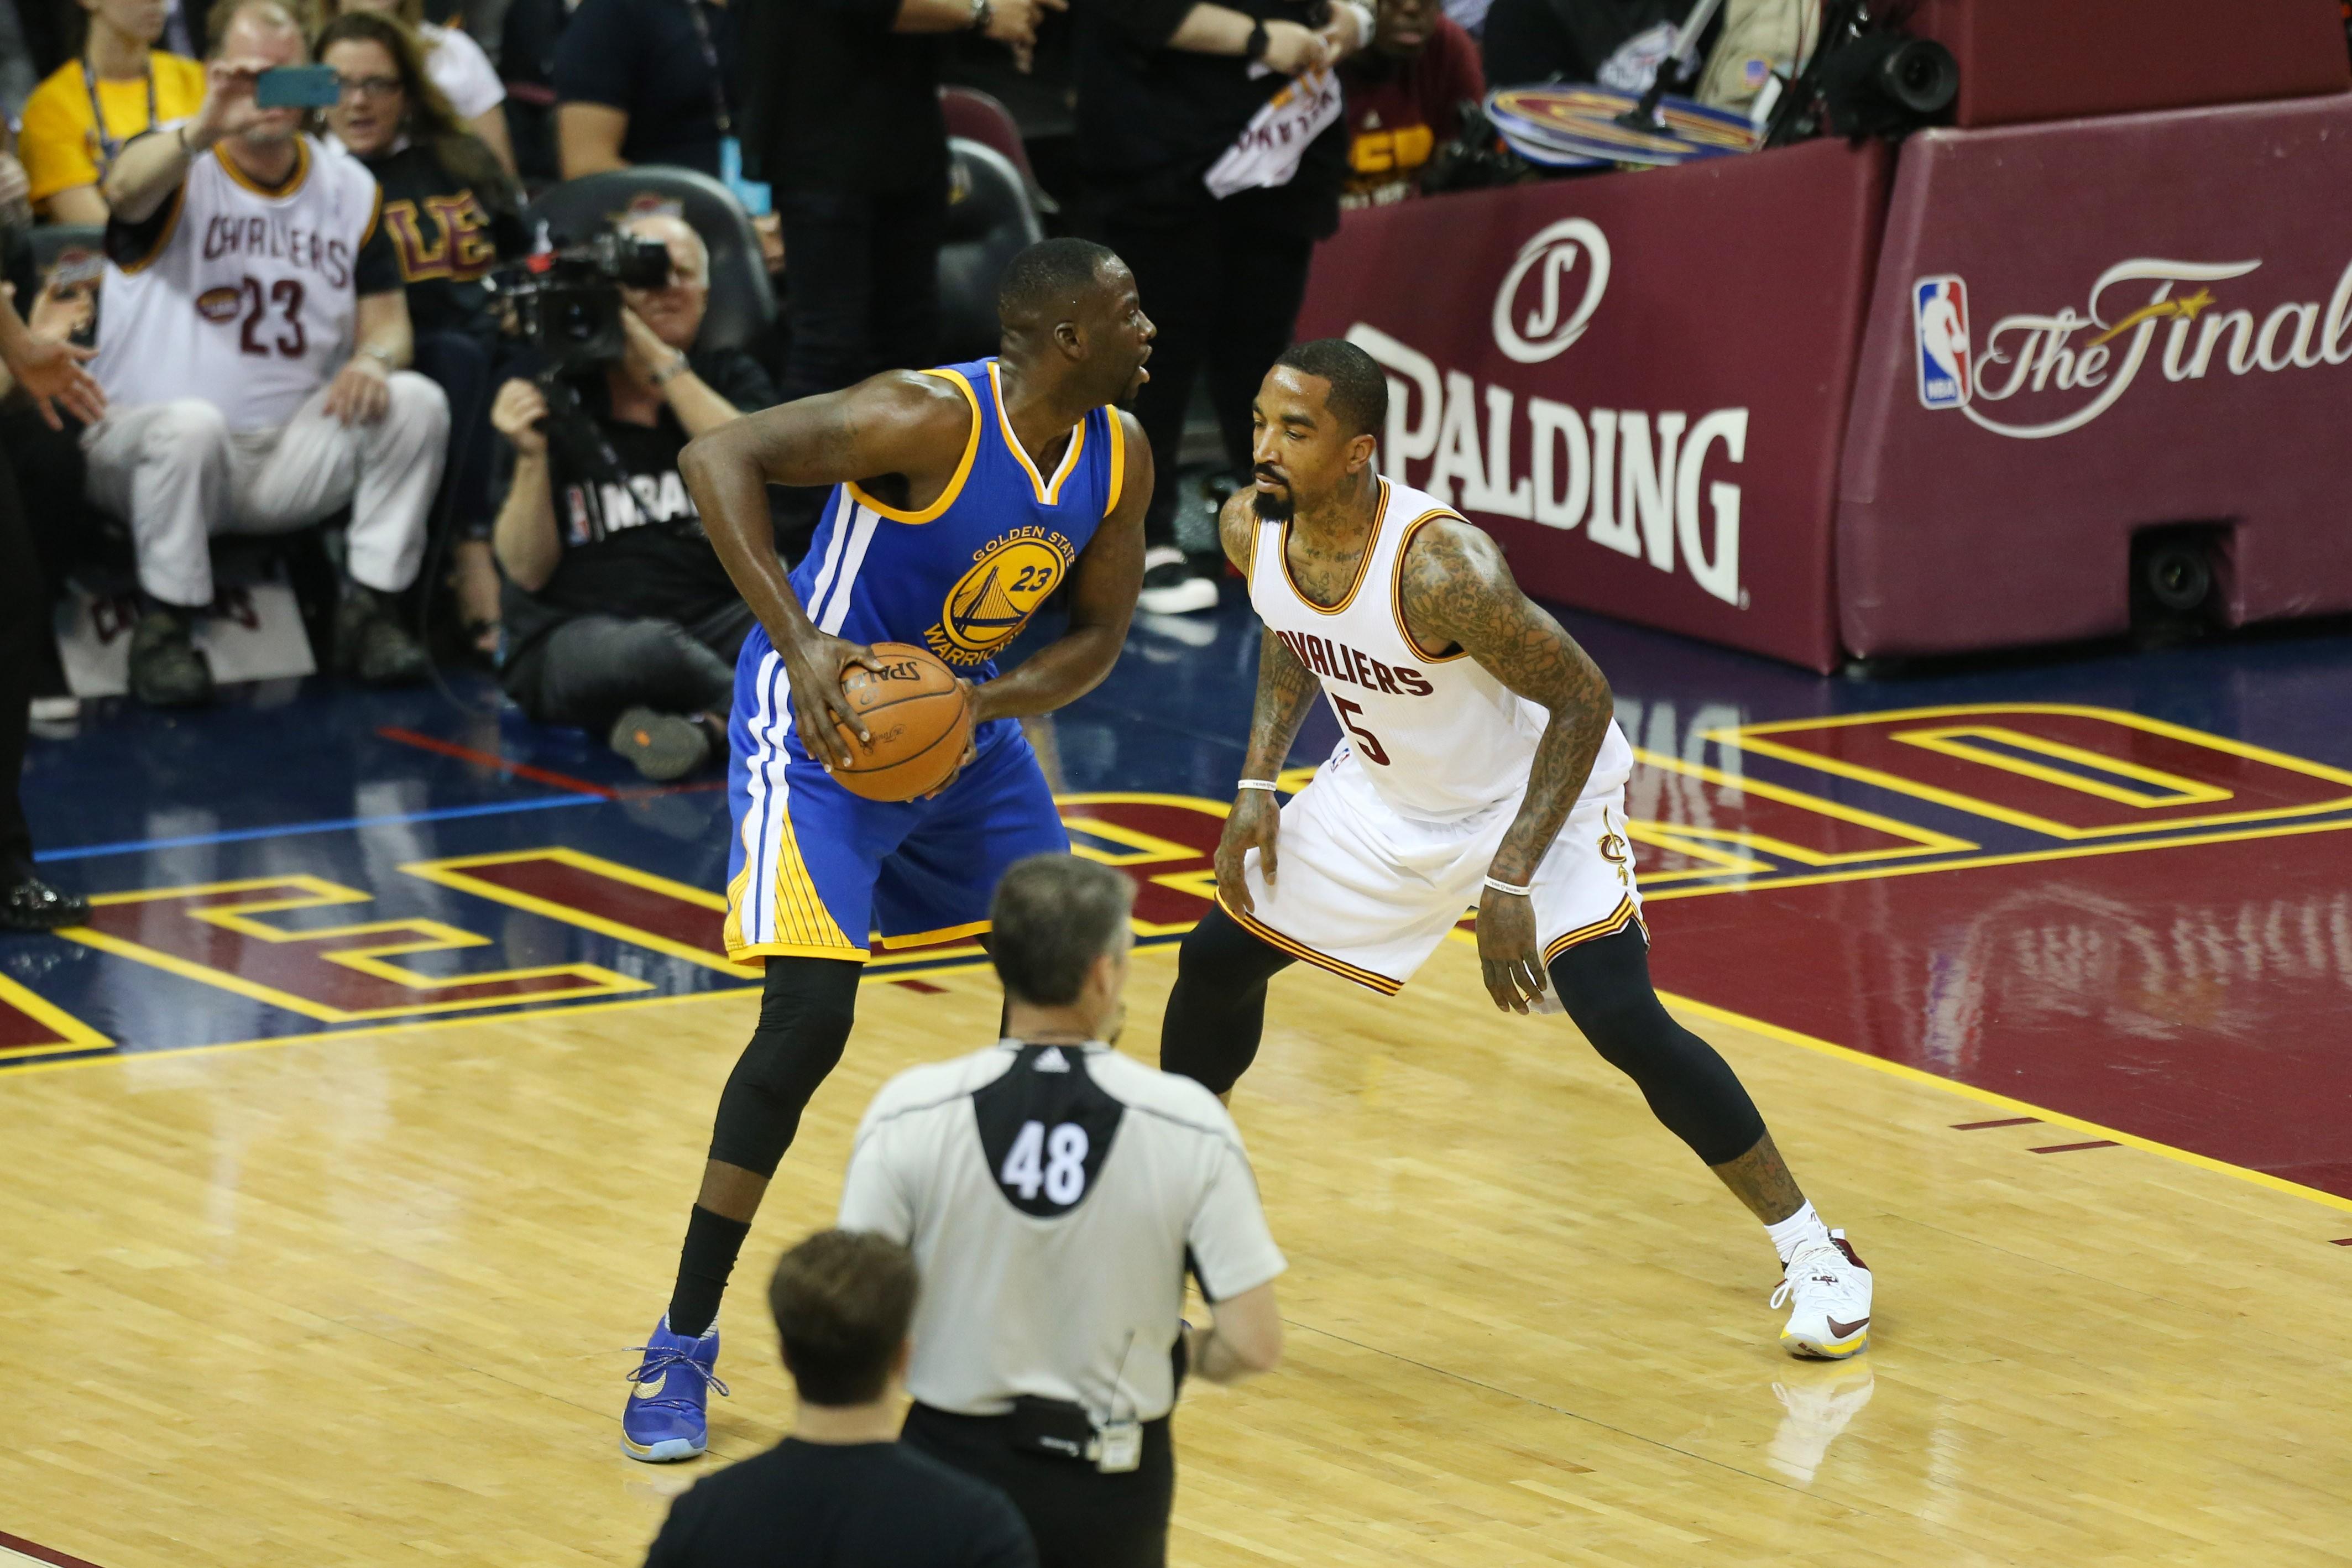 Nba Final Game 7 Score | All Basketball Scores Info